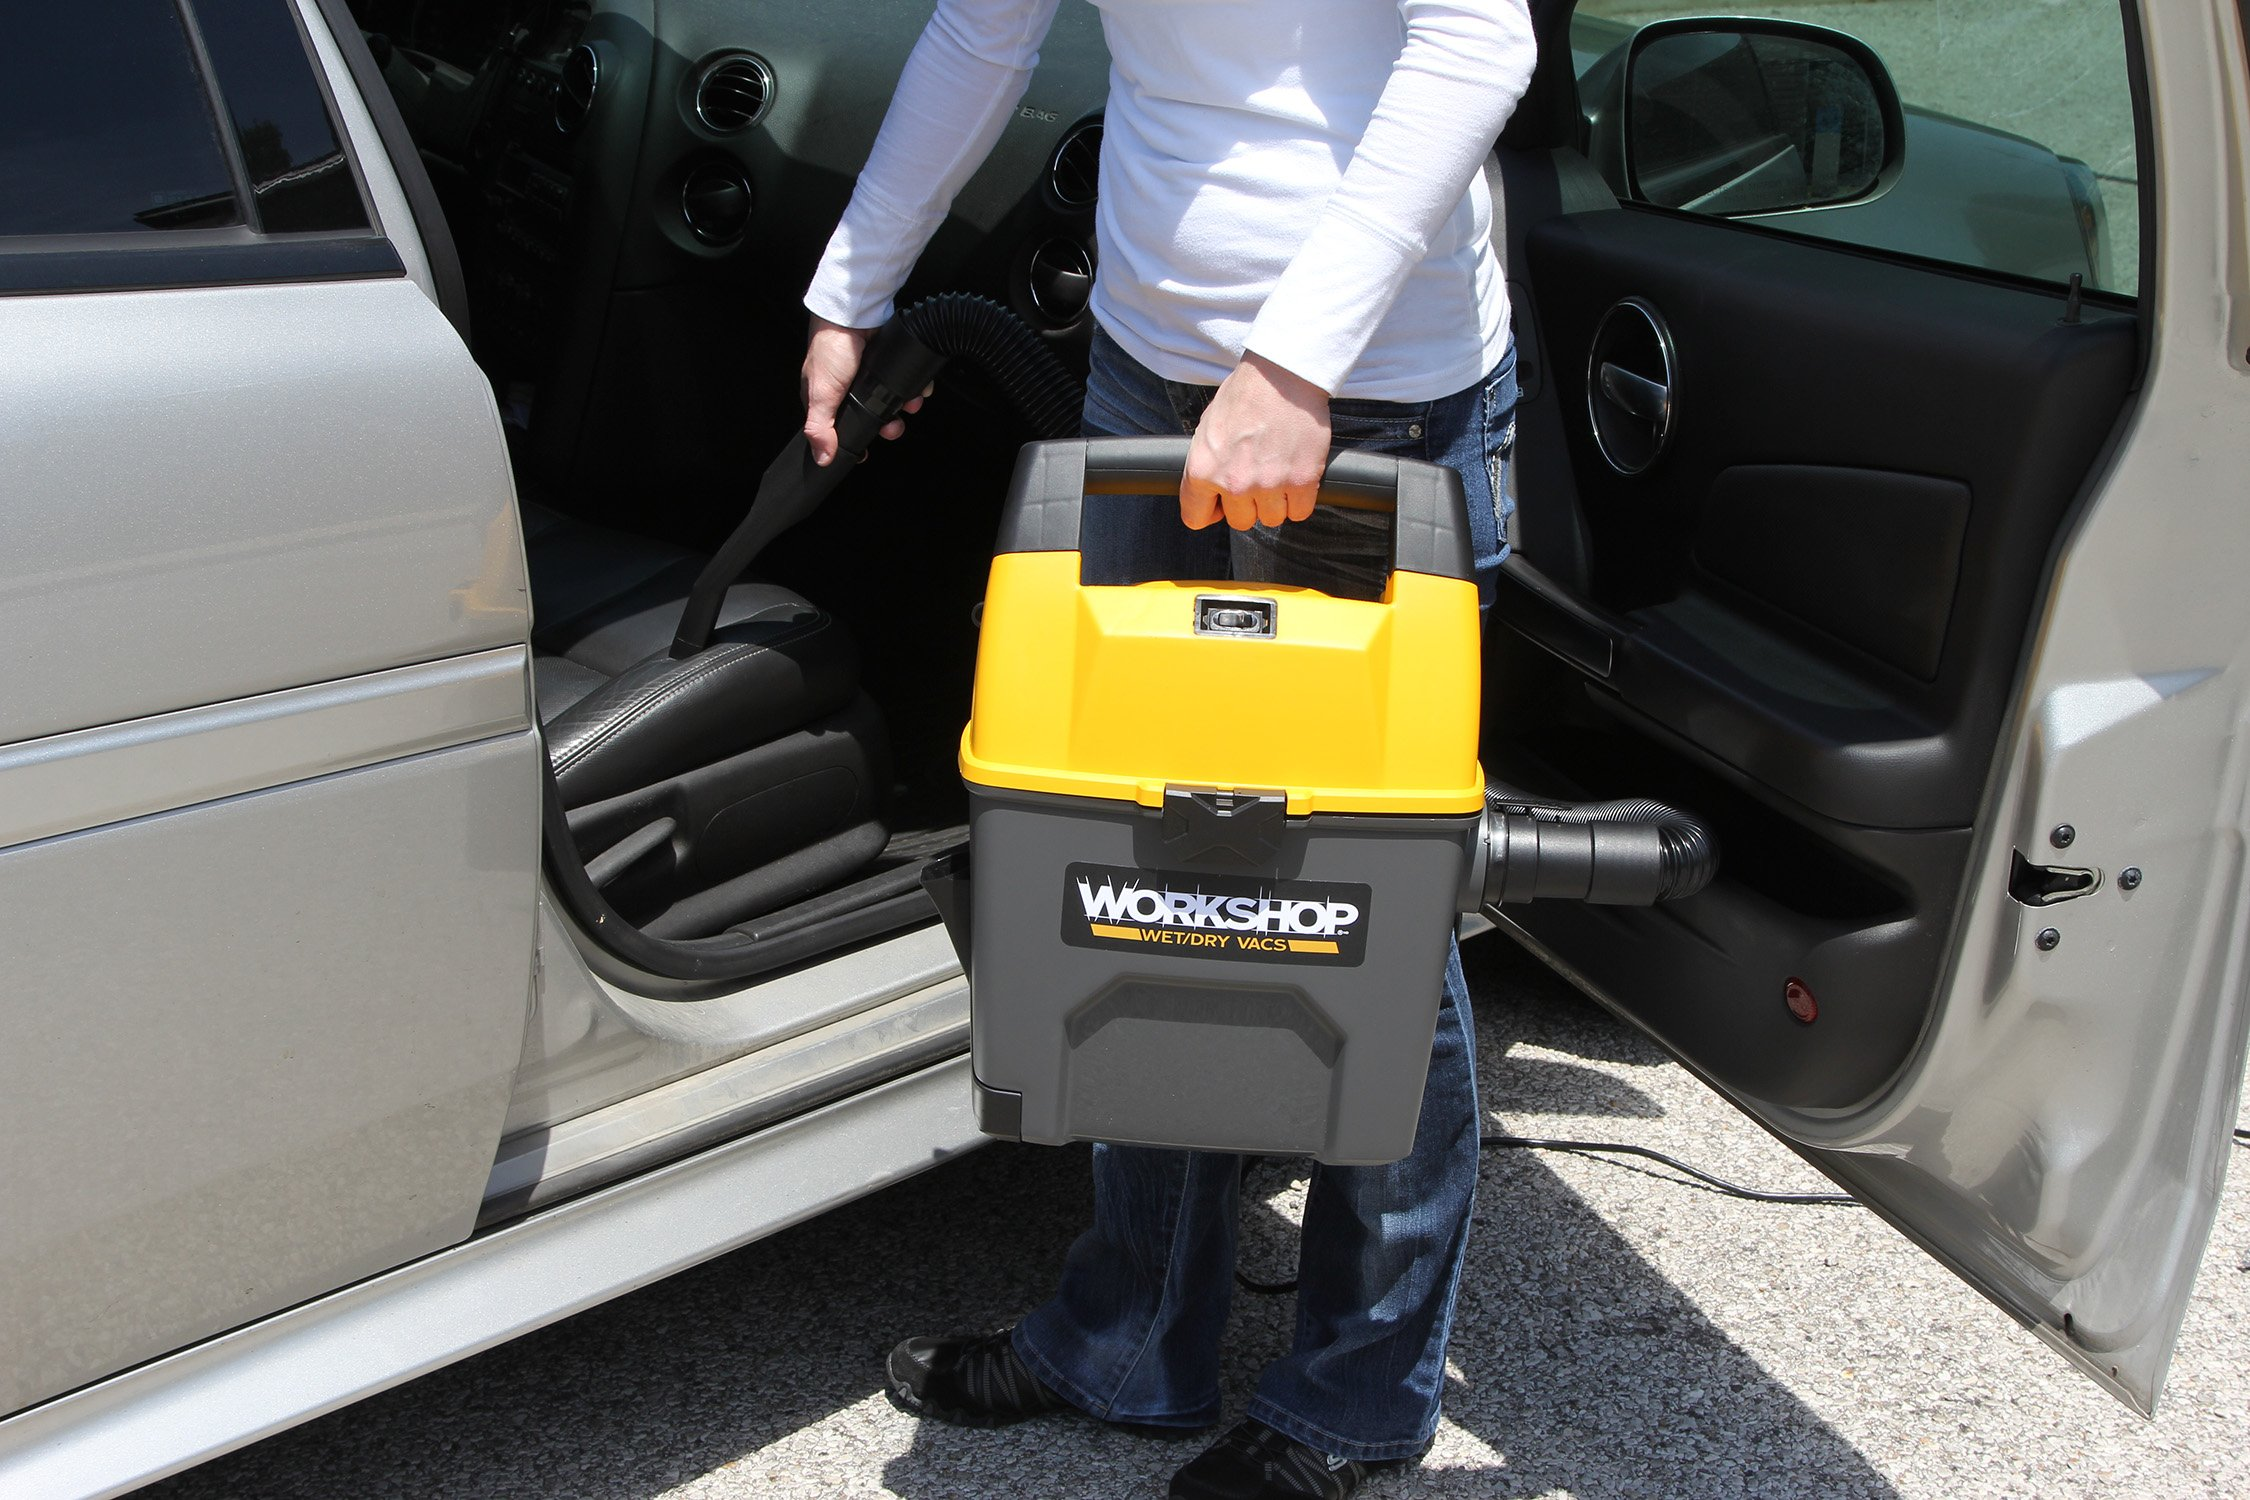 WORKSHOP Wet Dry Vac WS0301VA Portable Wet Dry Vacuum Cleaner For Car, 3-Gallon Wet Dry Auto Vacuum Cleaner, 3.5 Peak HP Portable Auto Vacuum With Accessories For Car Cleaning by WORKSHOP Wet/Dry Vacs (Image #6)